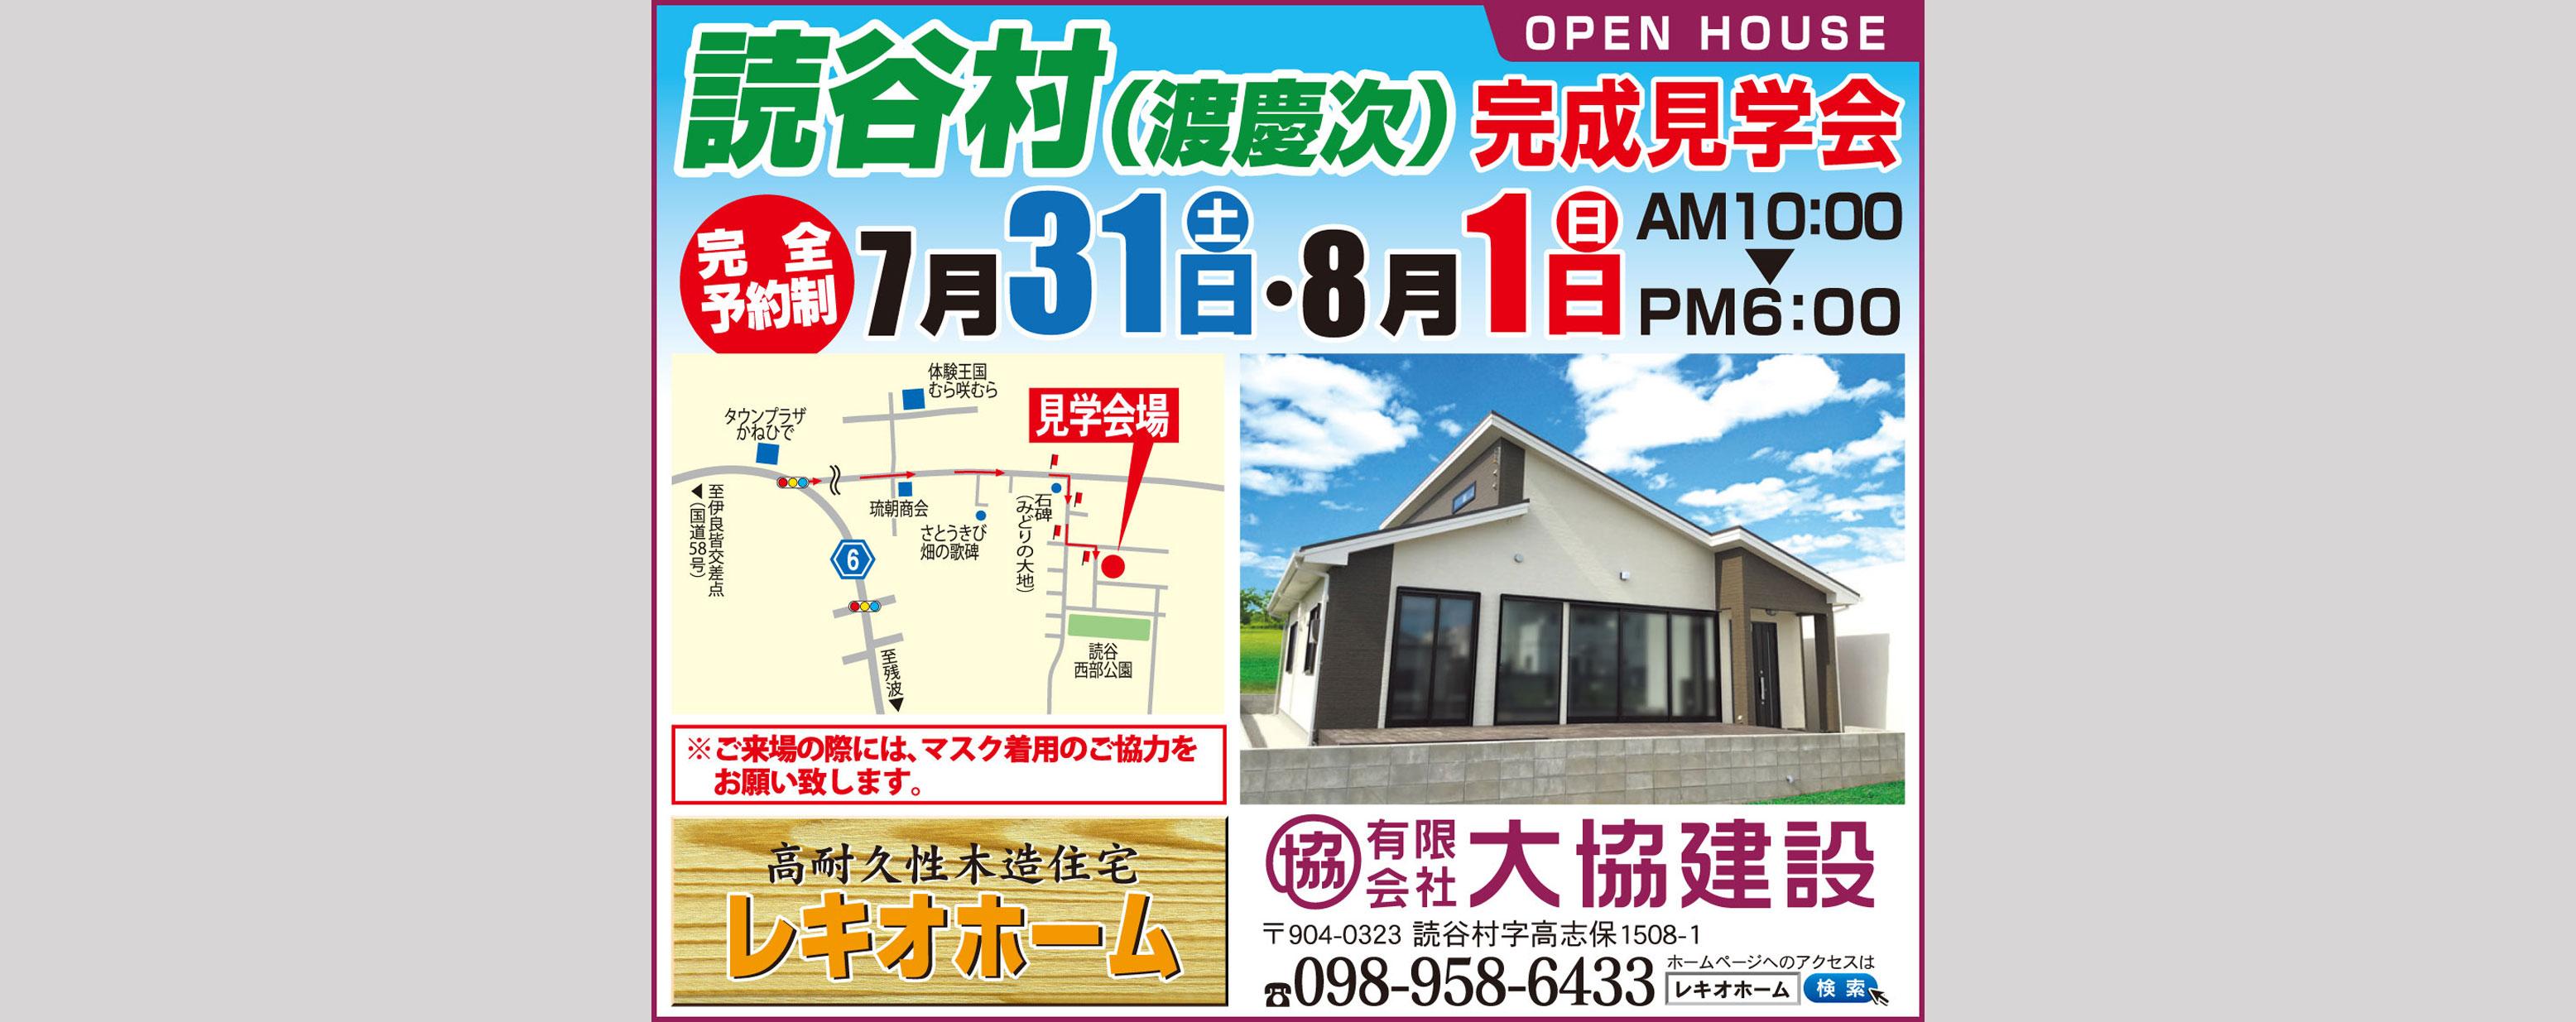 7/31~8/1に大協建設が読谷村渡慶次で完成見学会